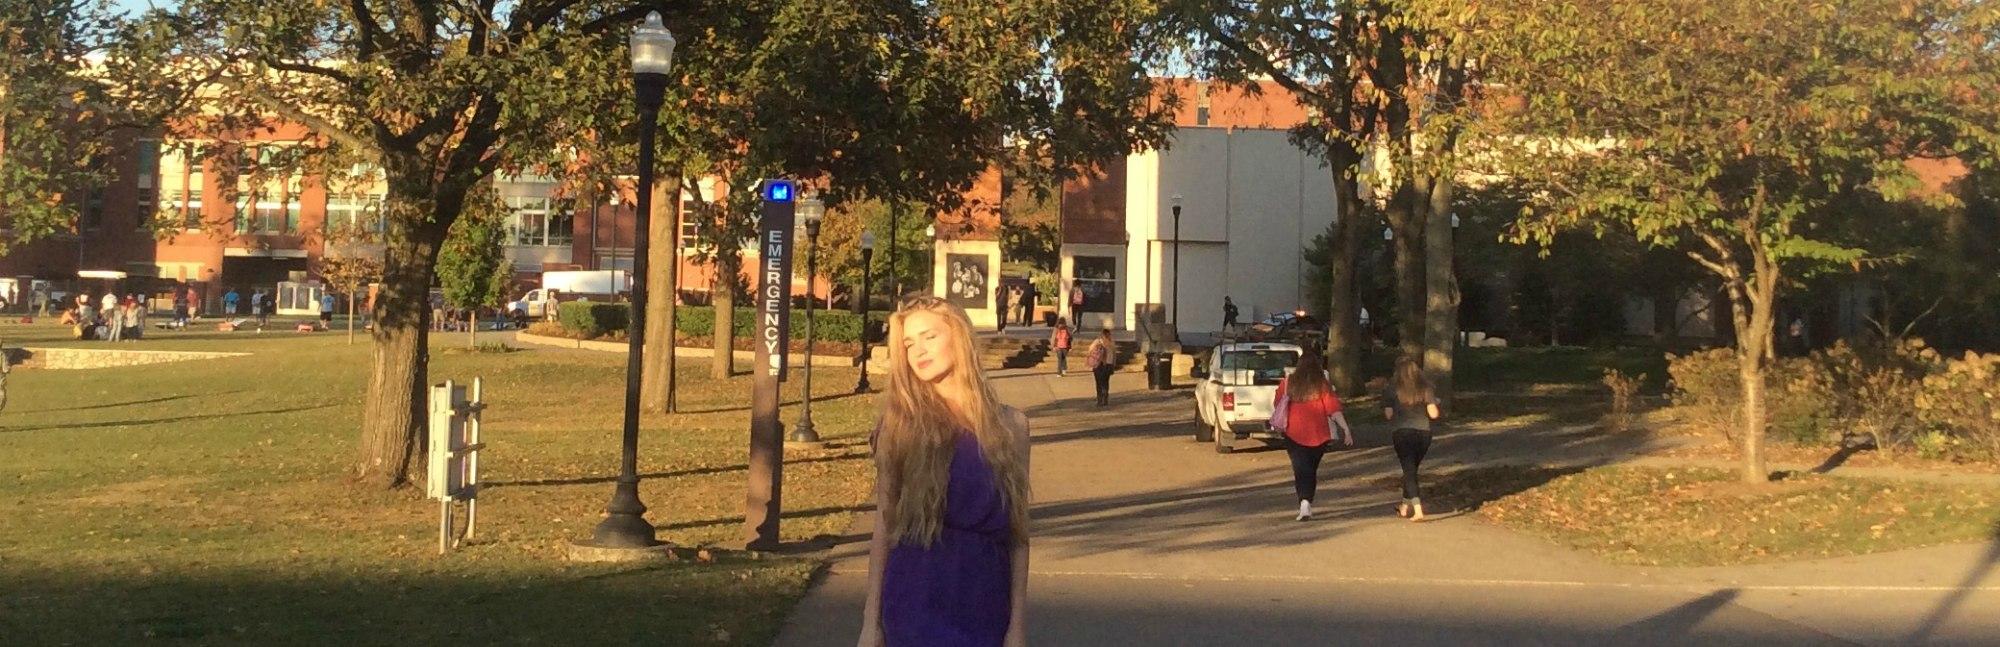 Western Kentucky University. Взгляд на учебу в США изнутри